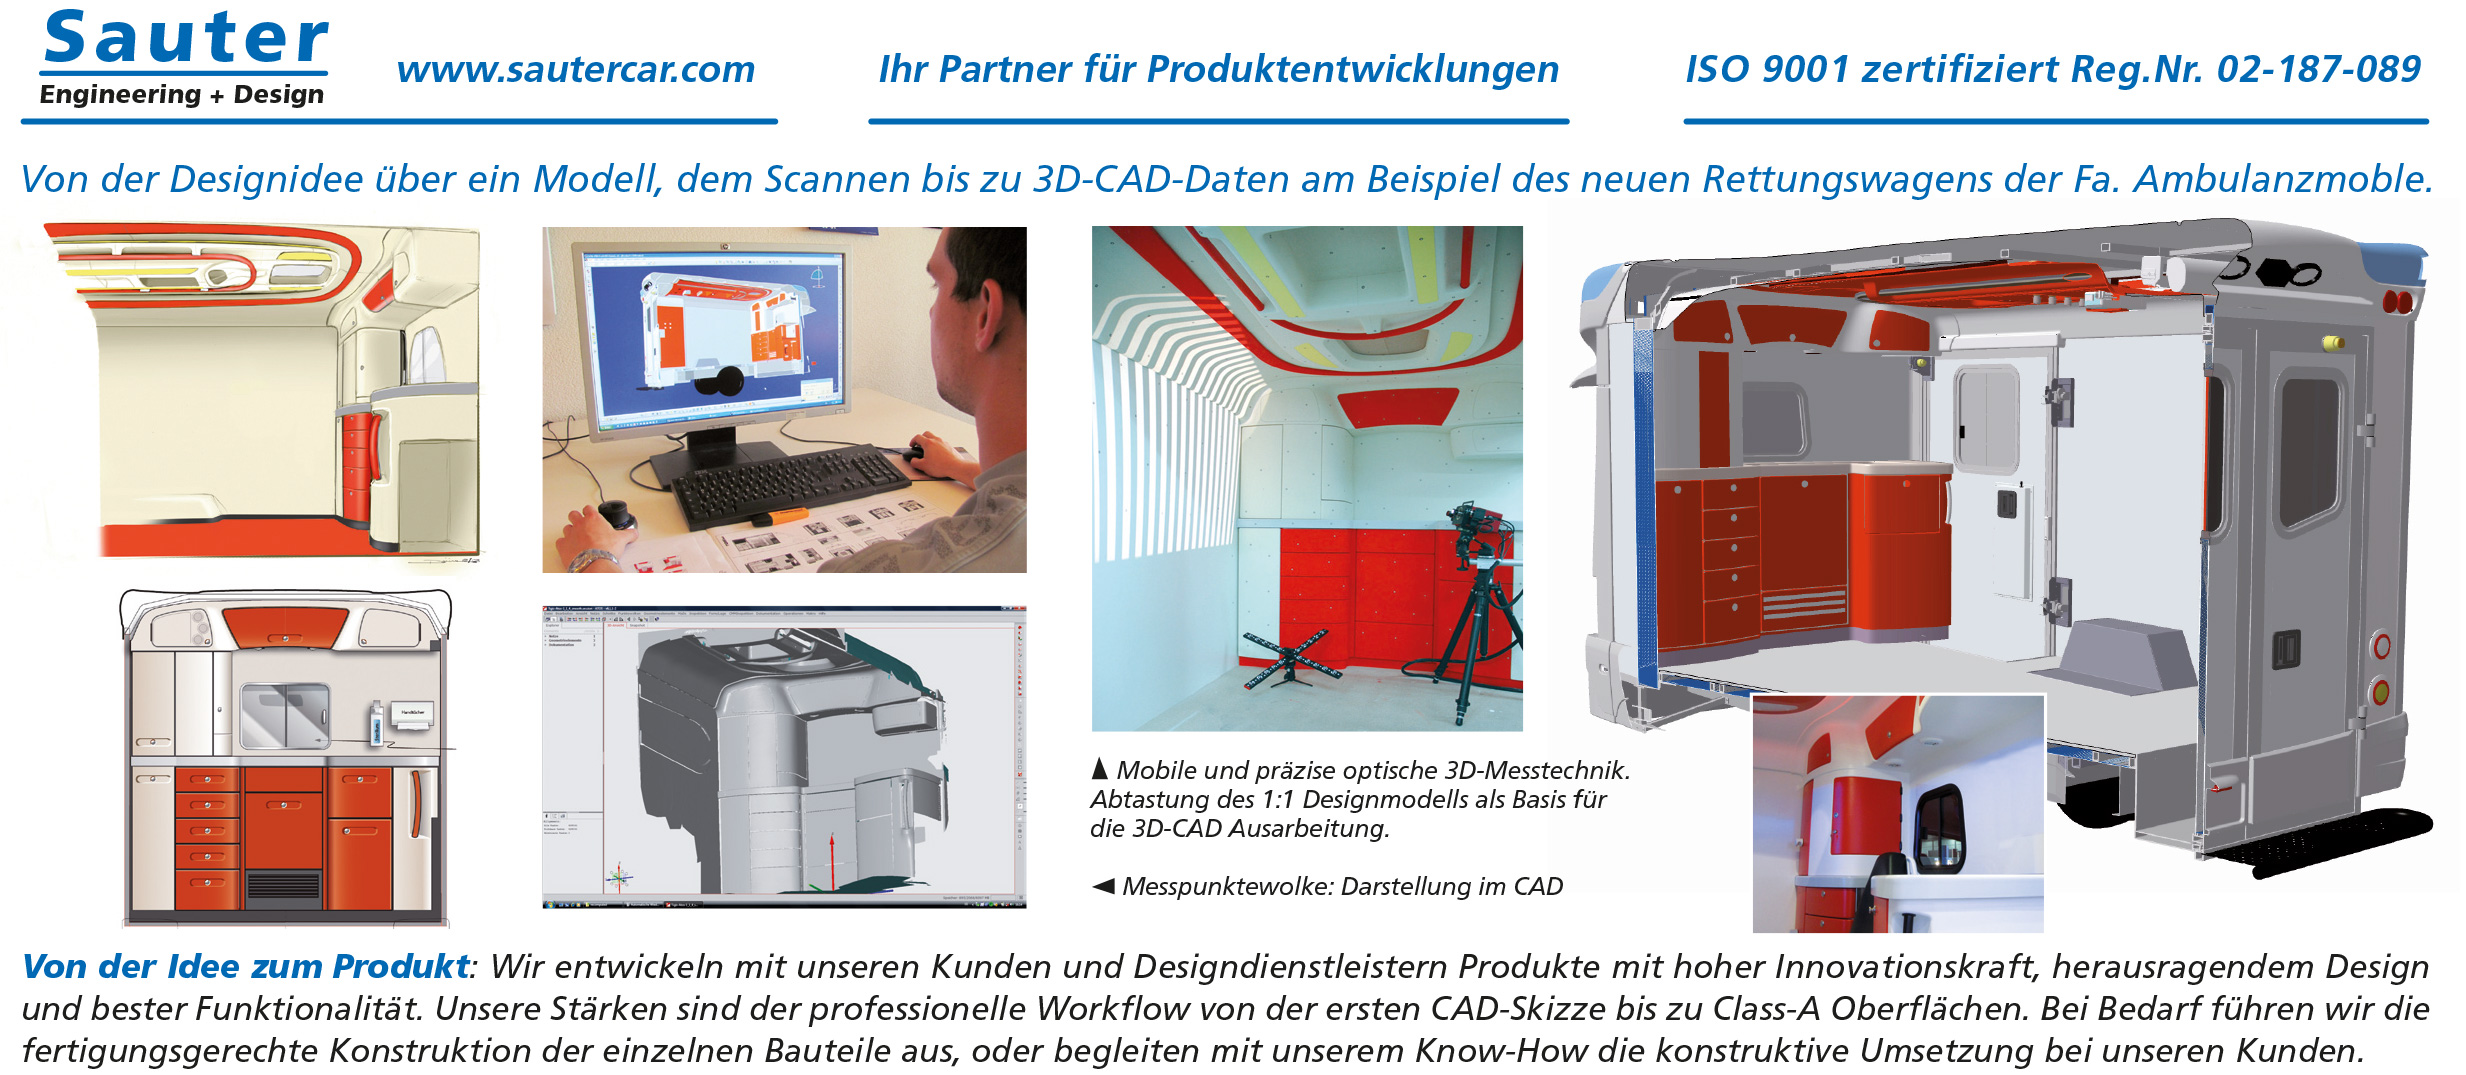 Beispielprojekt-TIGIS-Sauter-Catia-ICEM-Surf-3D-Scannen-Engineering-Schweiz-Deutschland-2